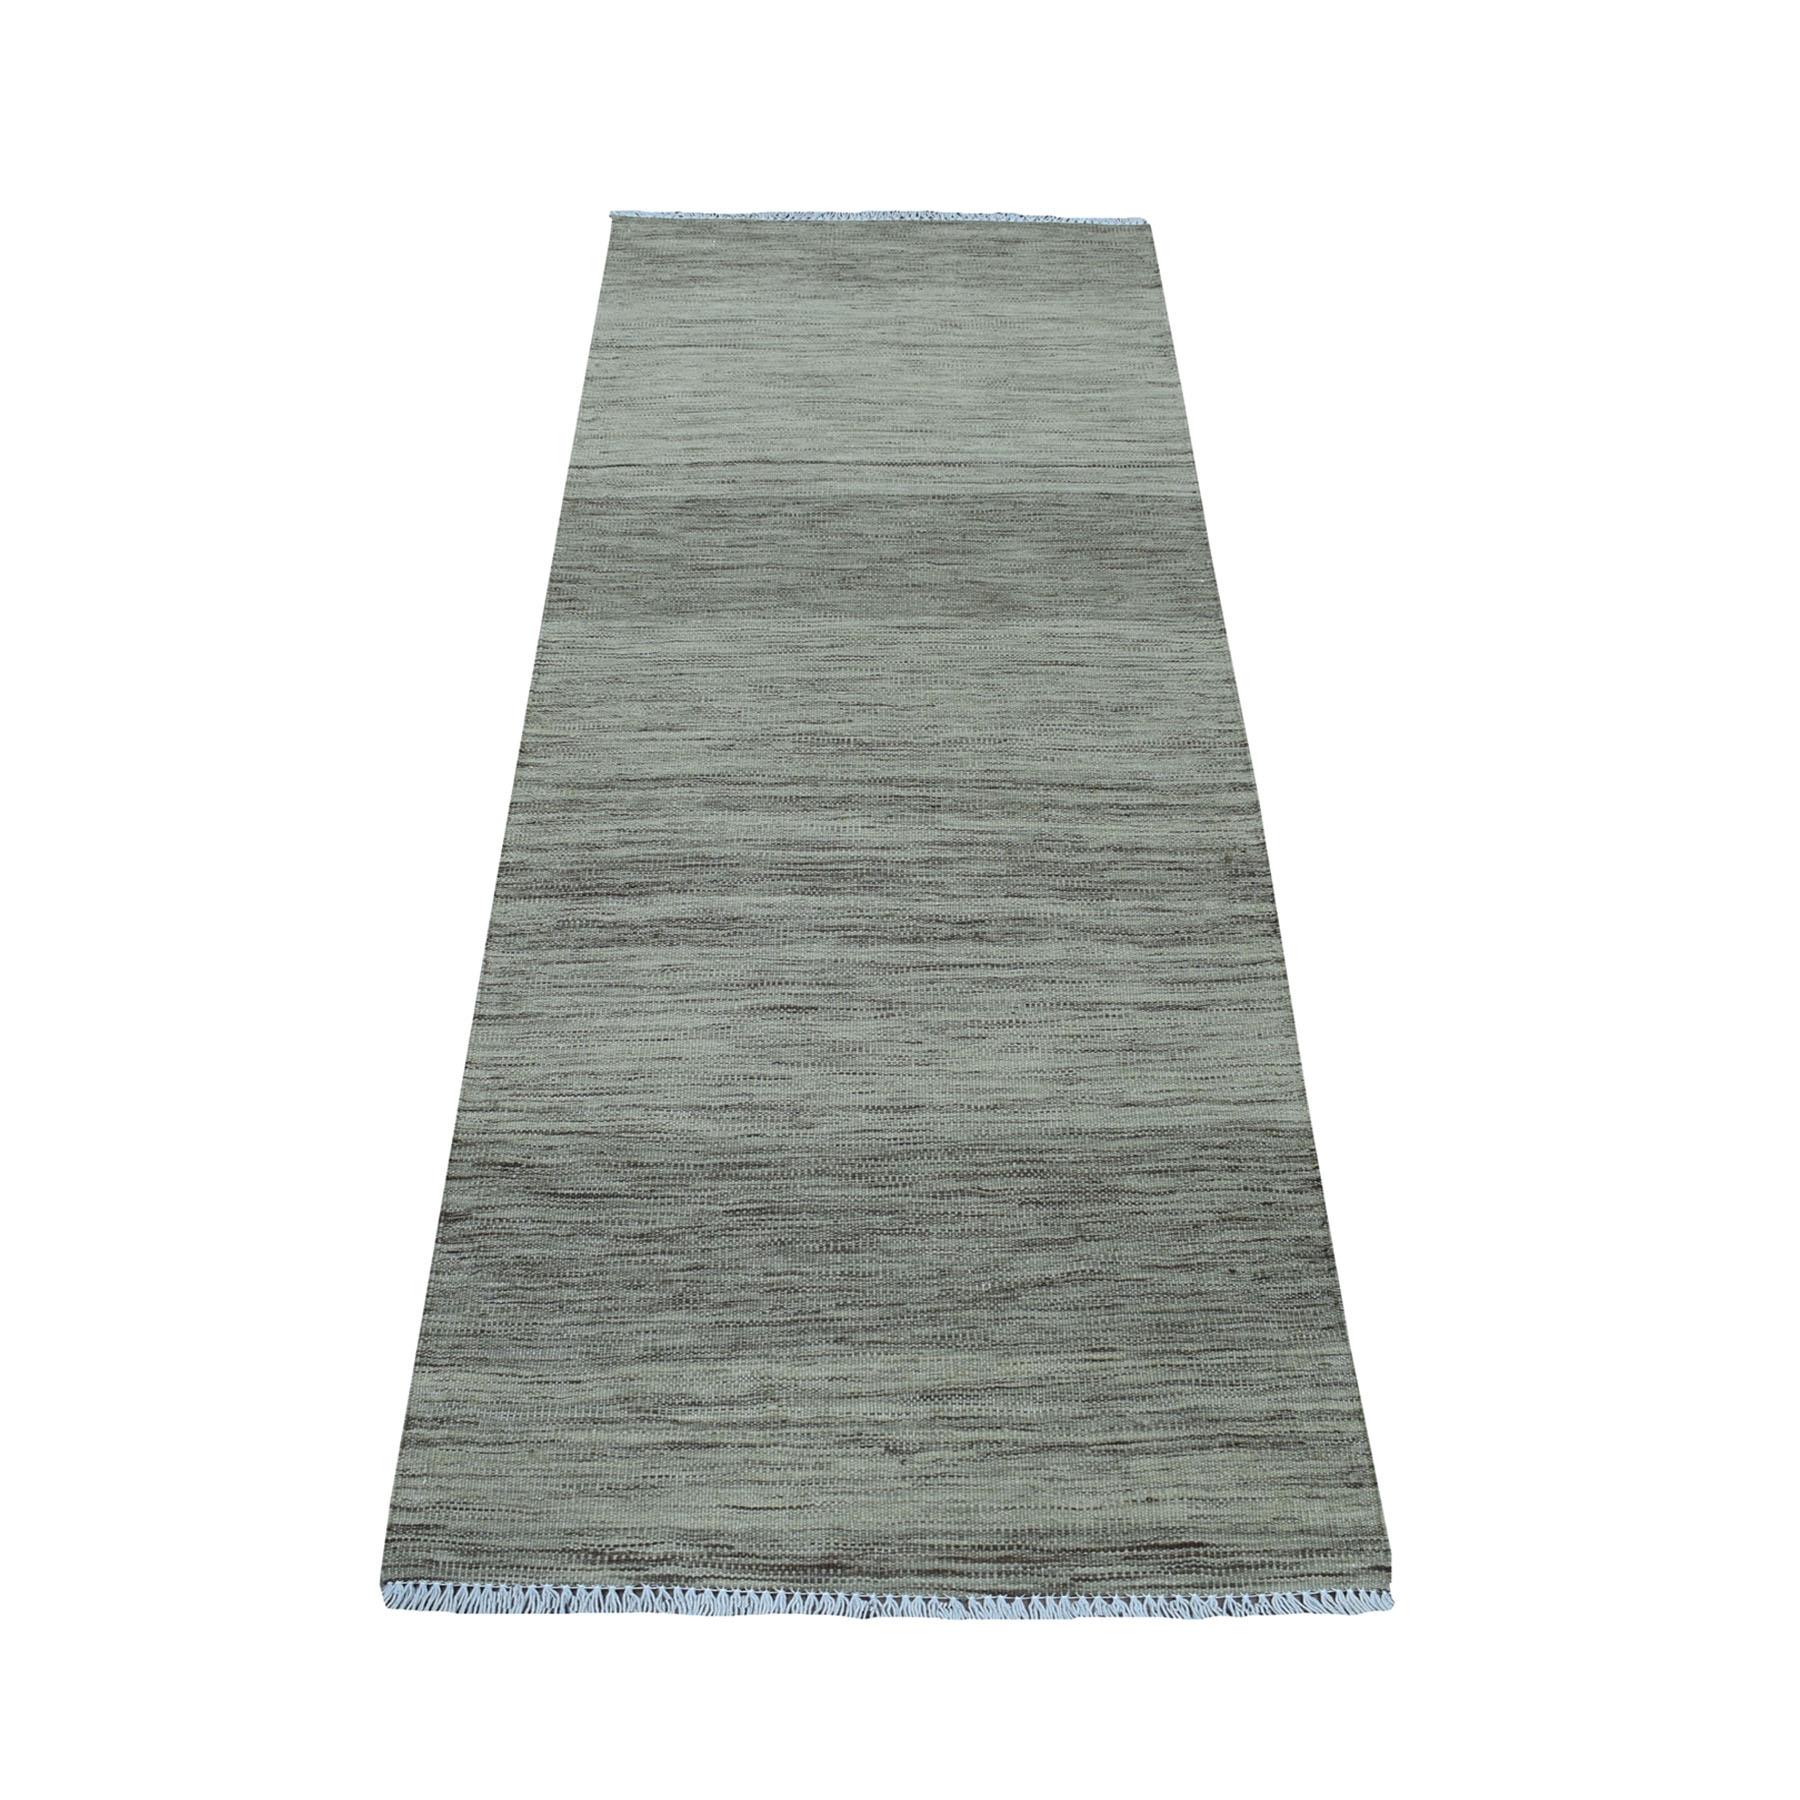 Fine Kilim Collection Hand Woven Grey Rug No: 01107712